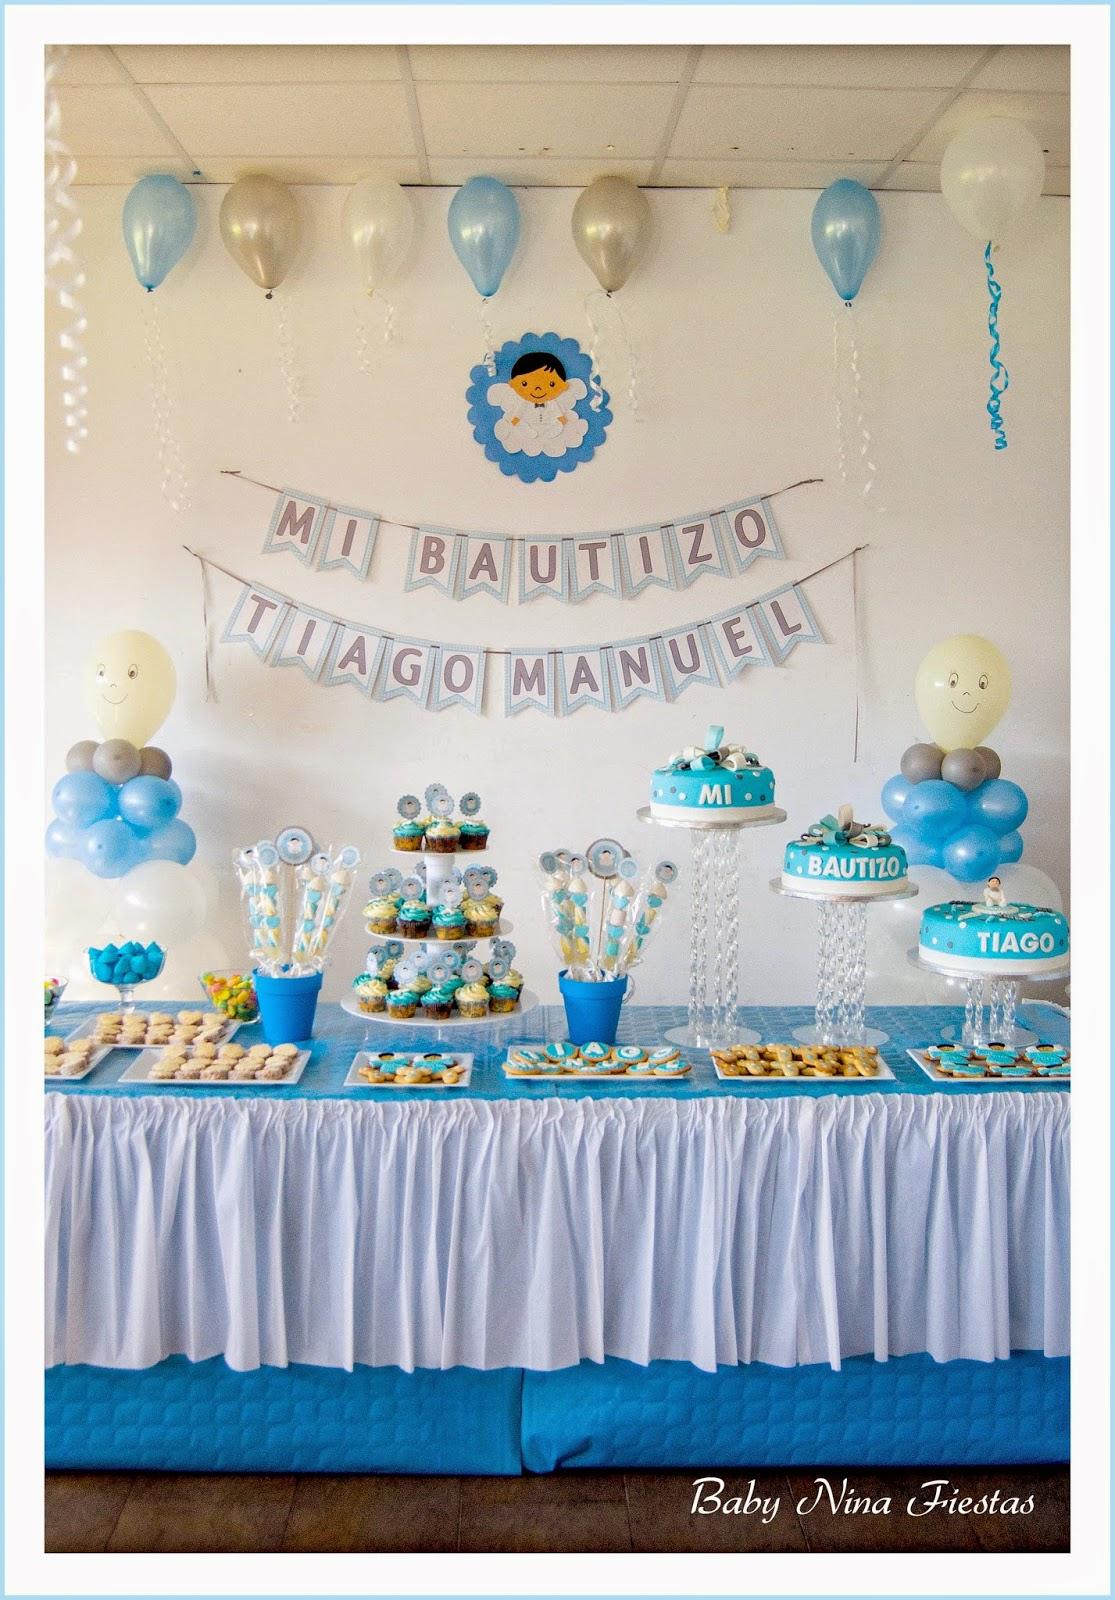 Baby nina fiestas mayo 2014 for Mesa de dulces para bautizo de nina